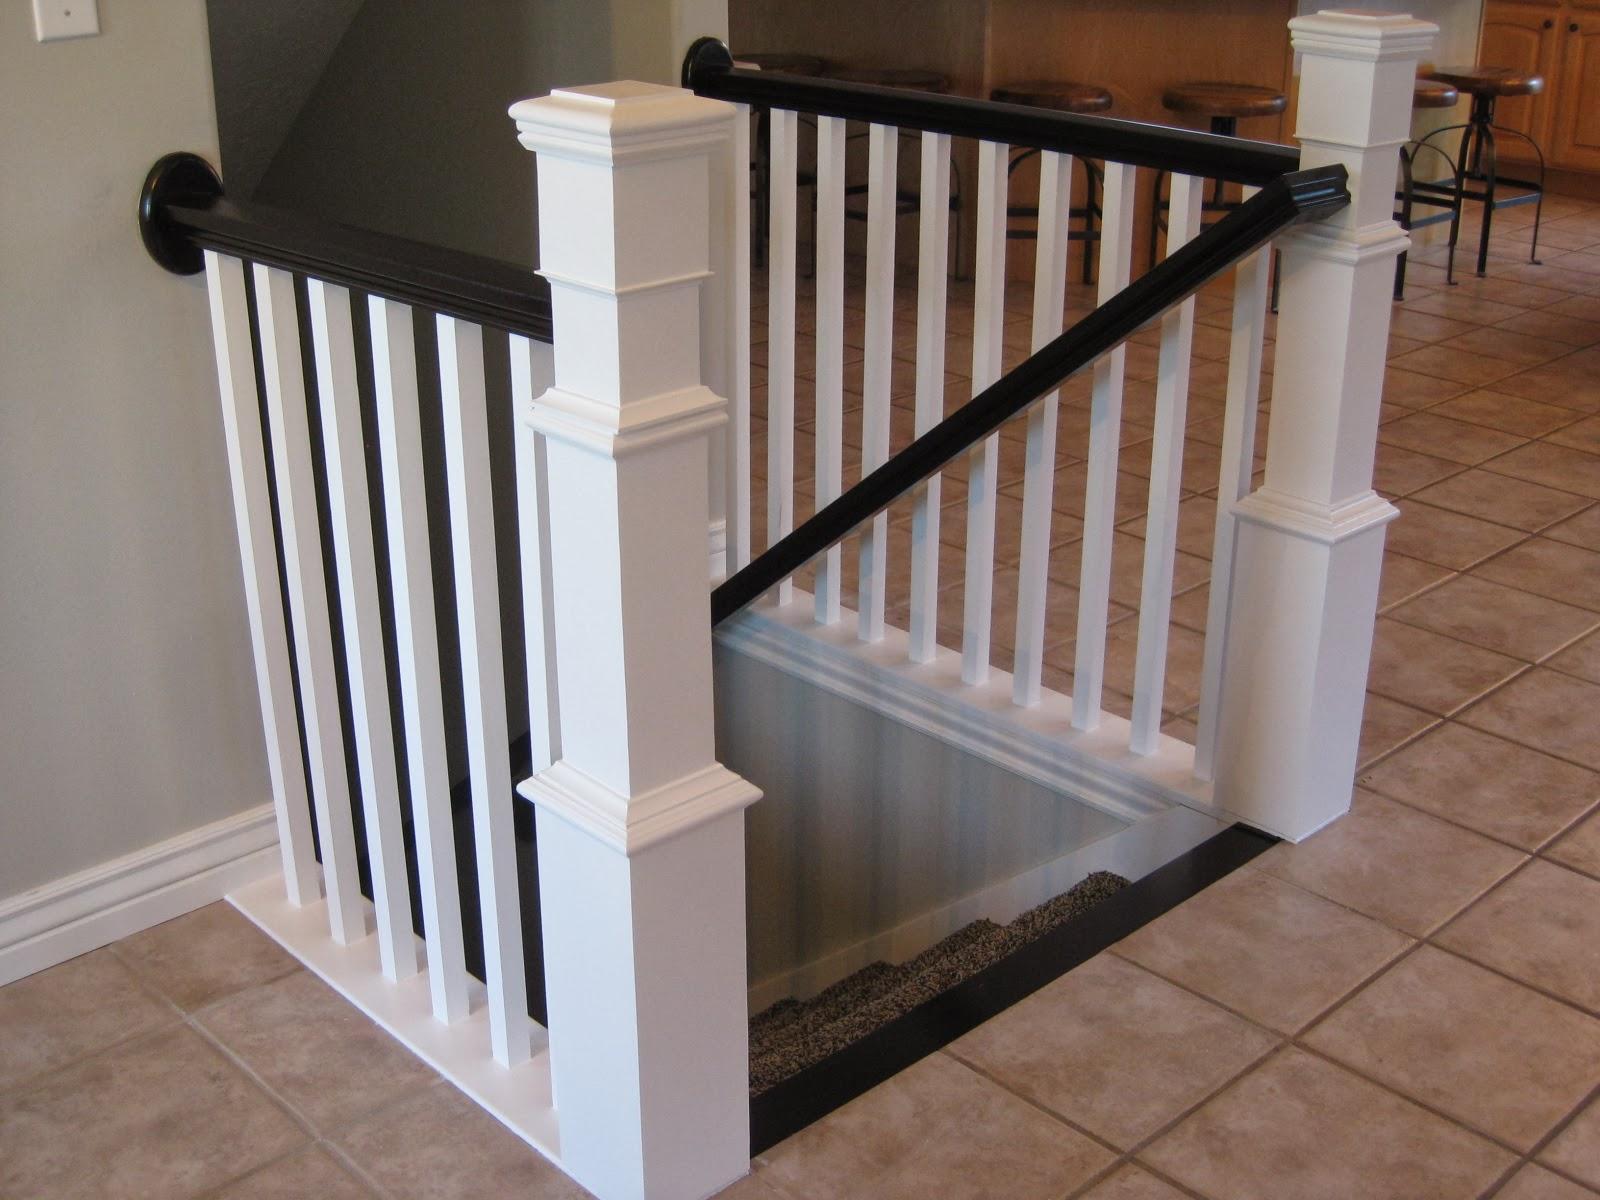 tda decorating and design diy stair banister tutorial